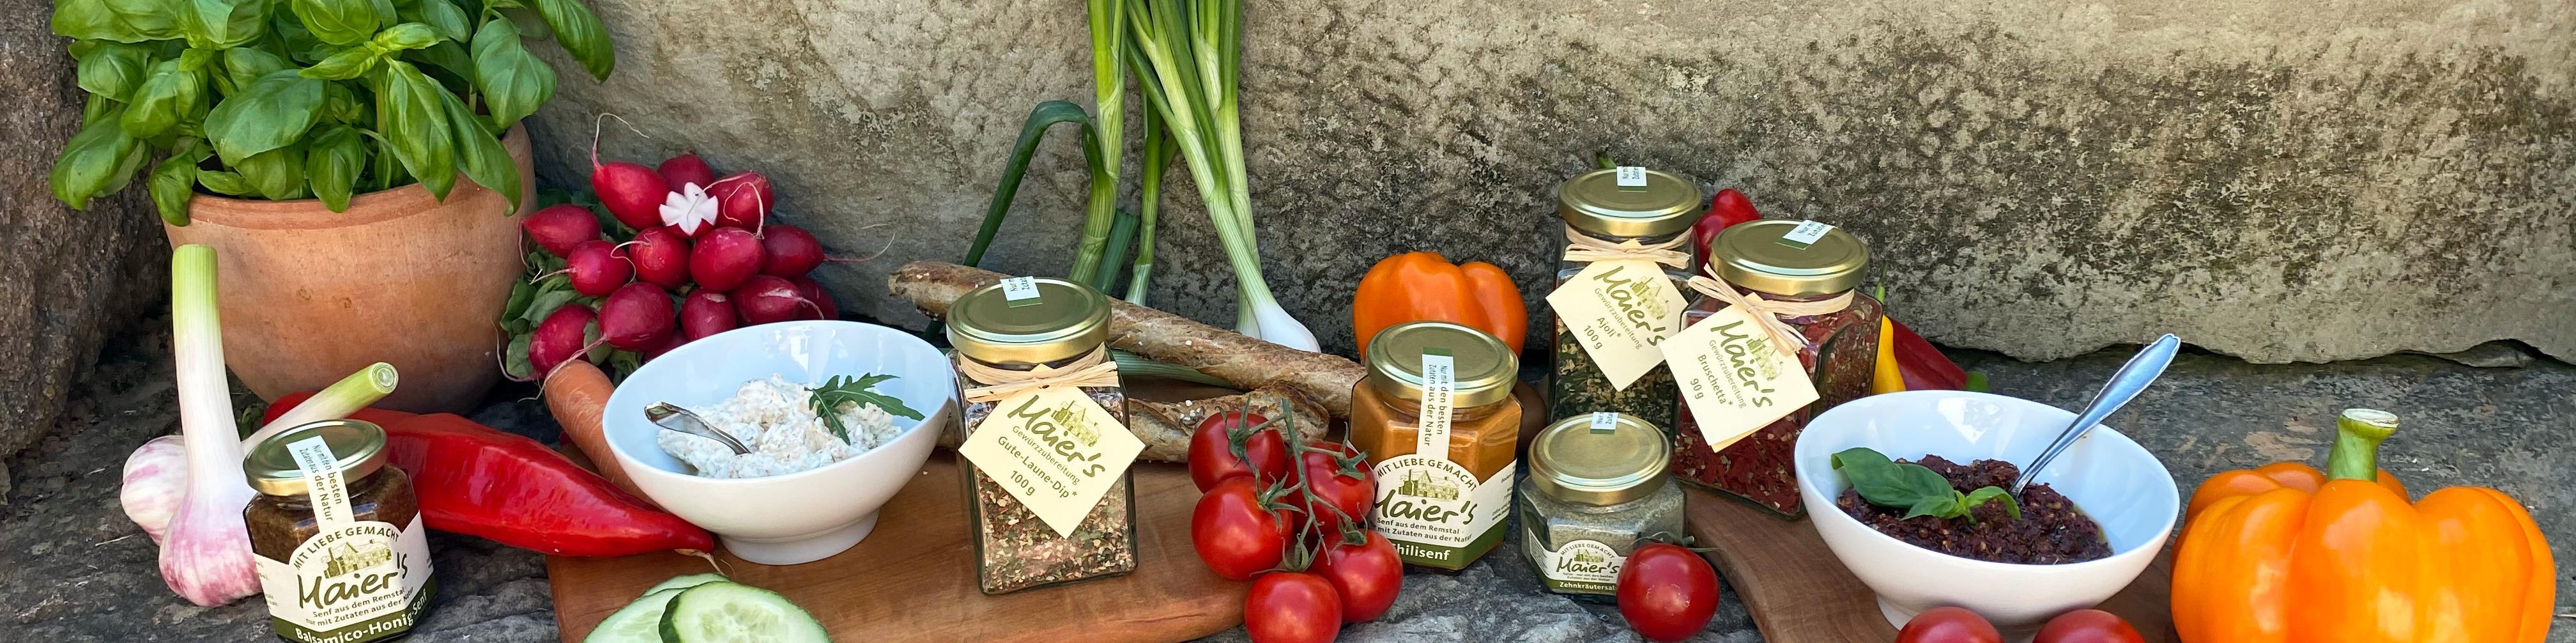 Maier's Genuss Kräuterzubereitungen (Dips), Senfe und Salze